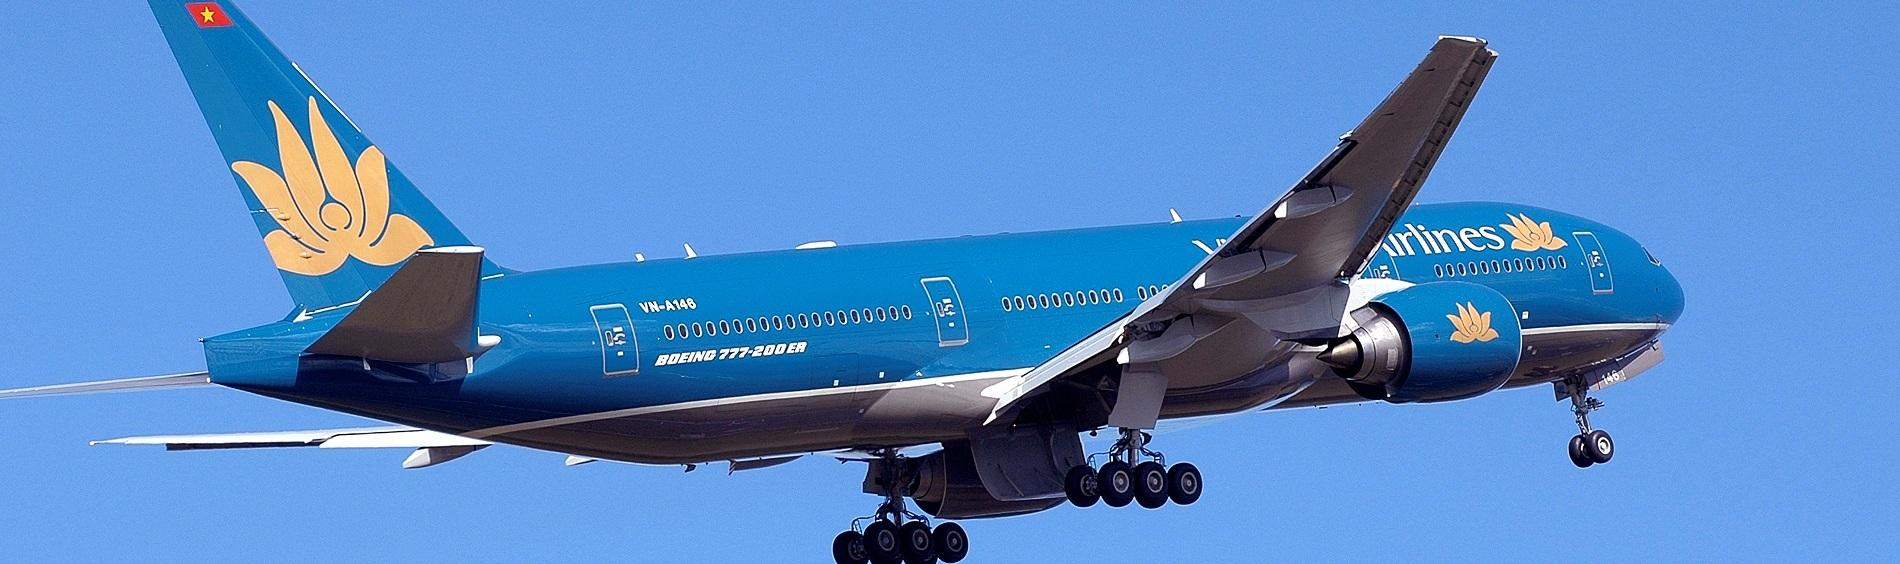 Slide vé máy bay 3